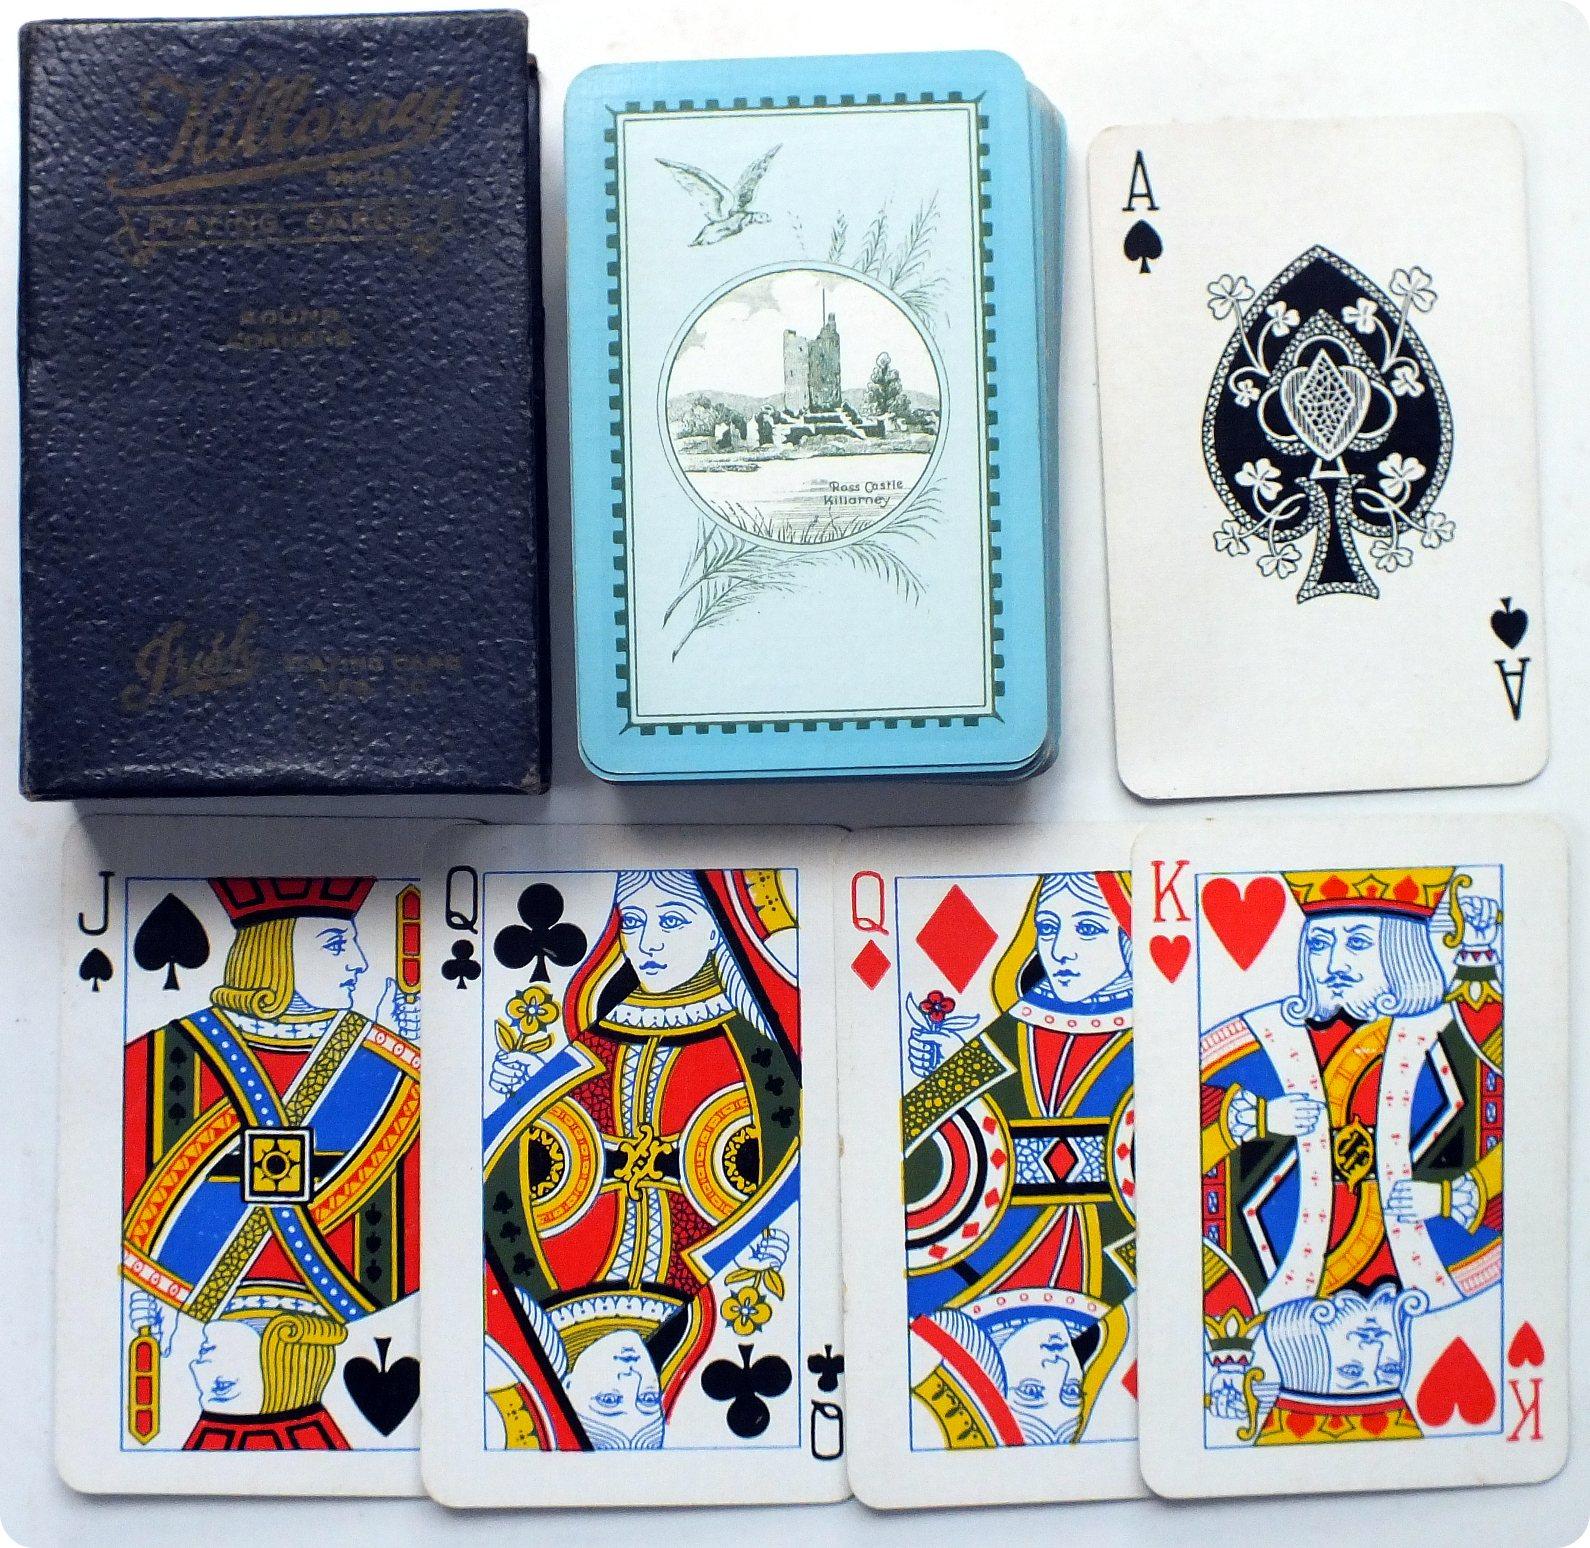 Killarney Series playing cards by the Irish Playing Card Mfg Co., c.1920